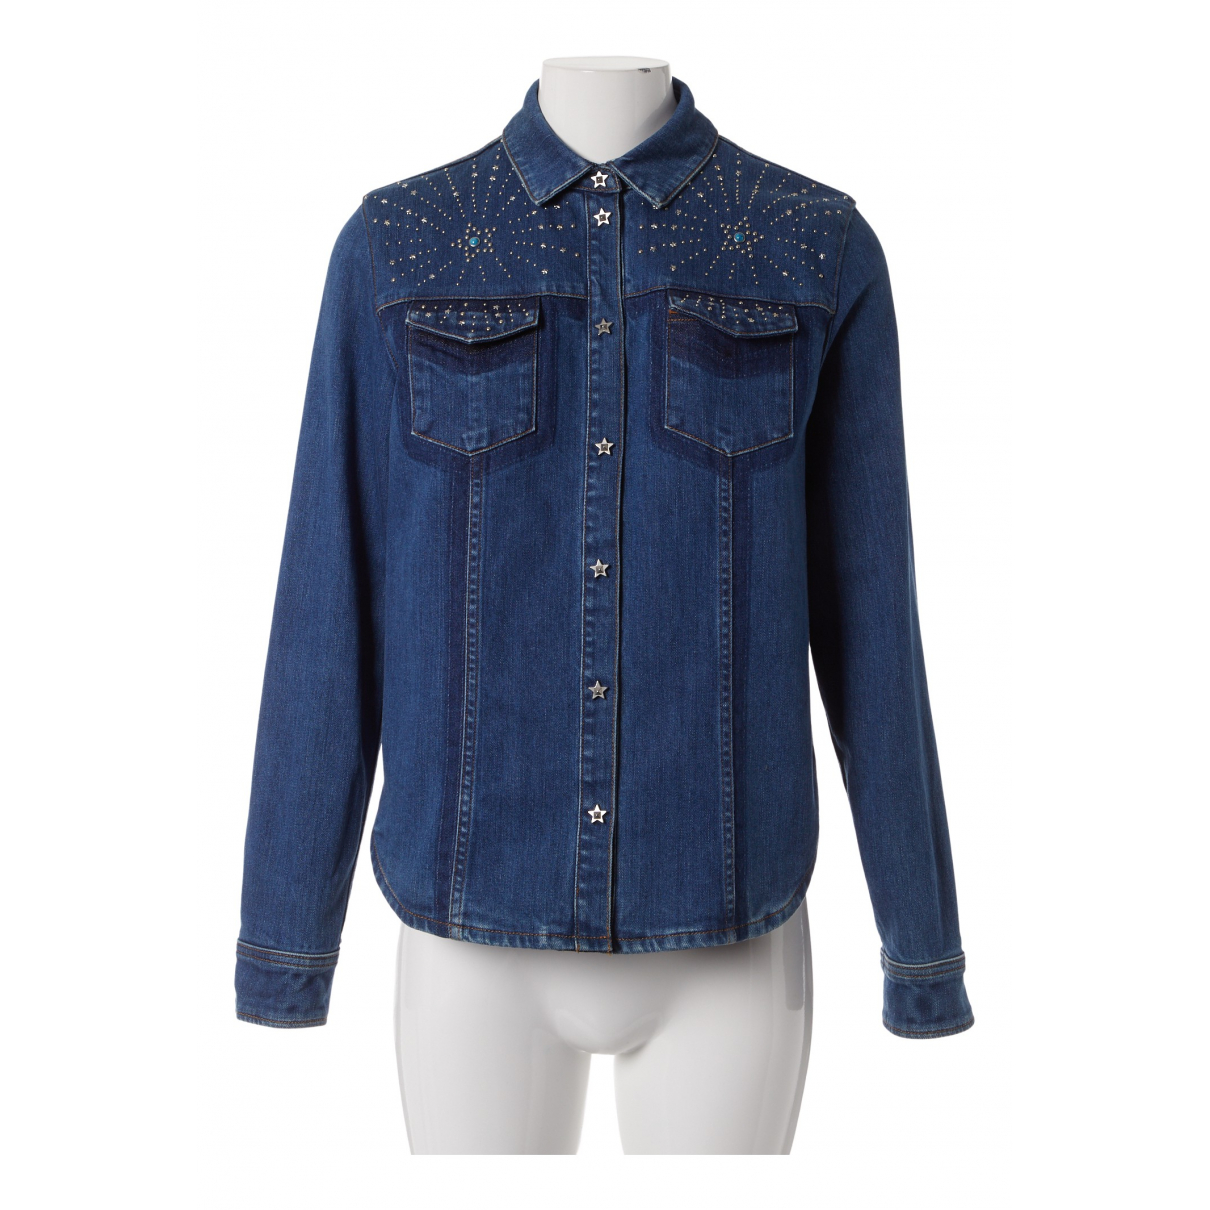 Valentino Garavani \N Jacke in  Blau Denim - Jeans